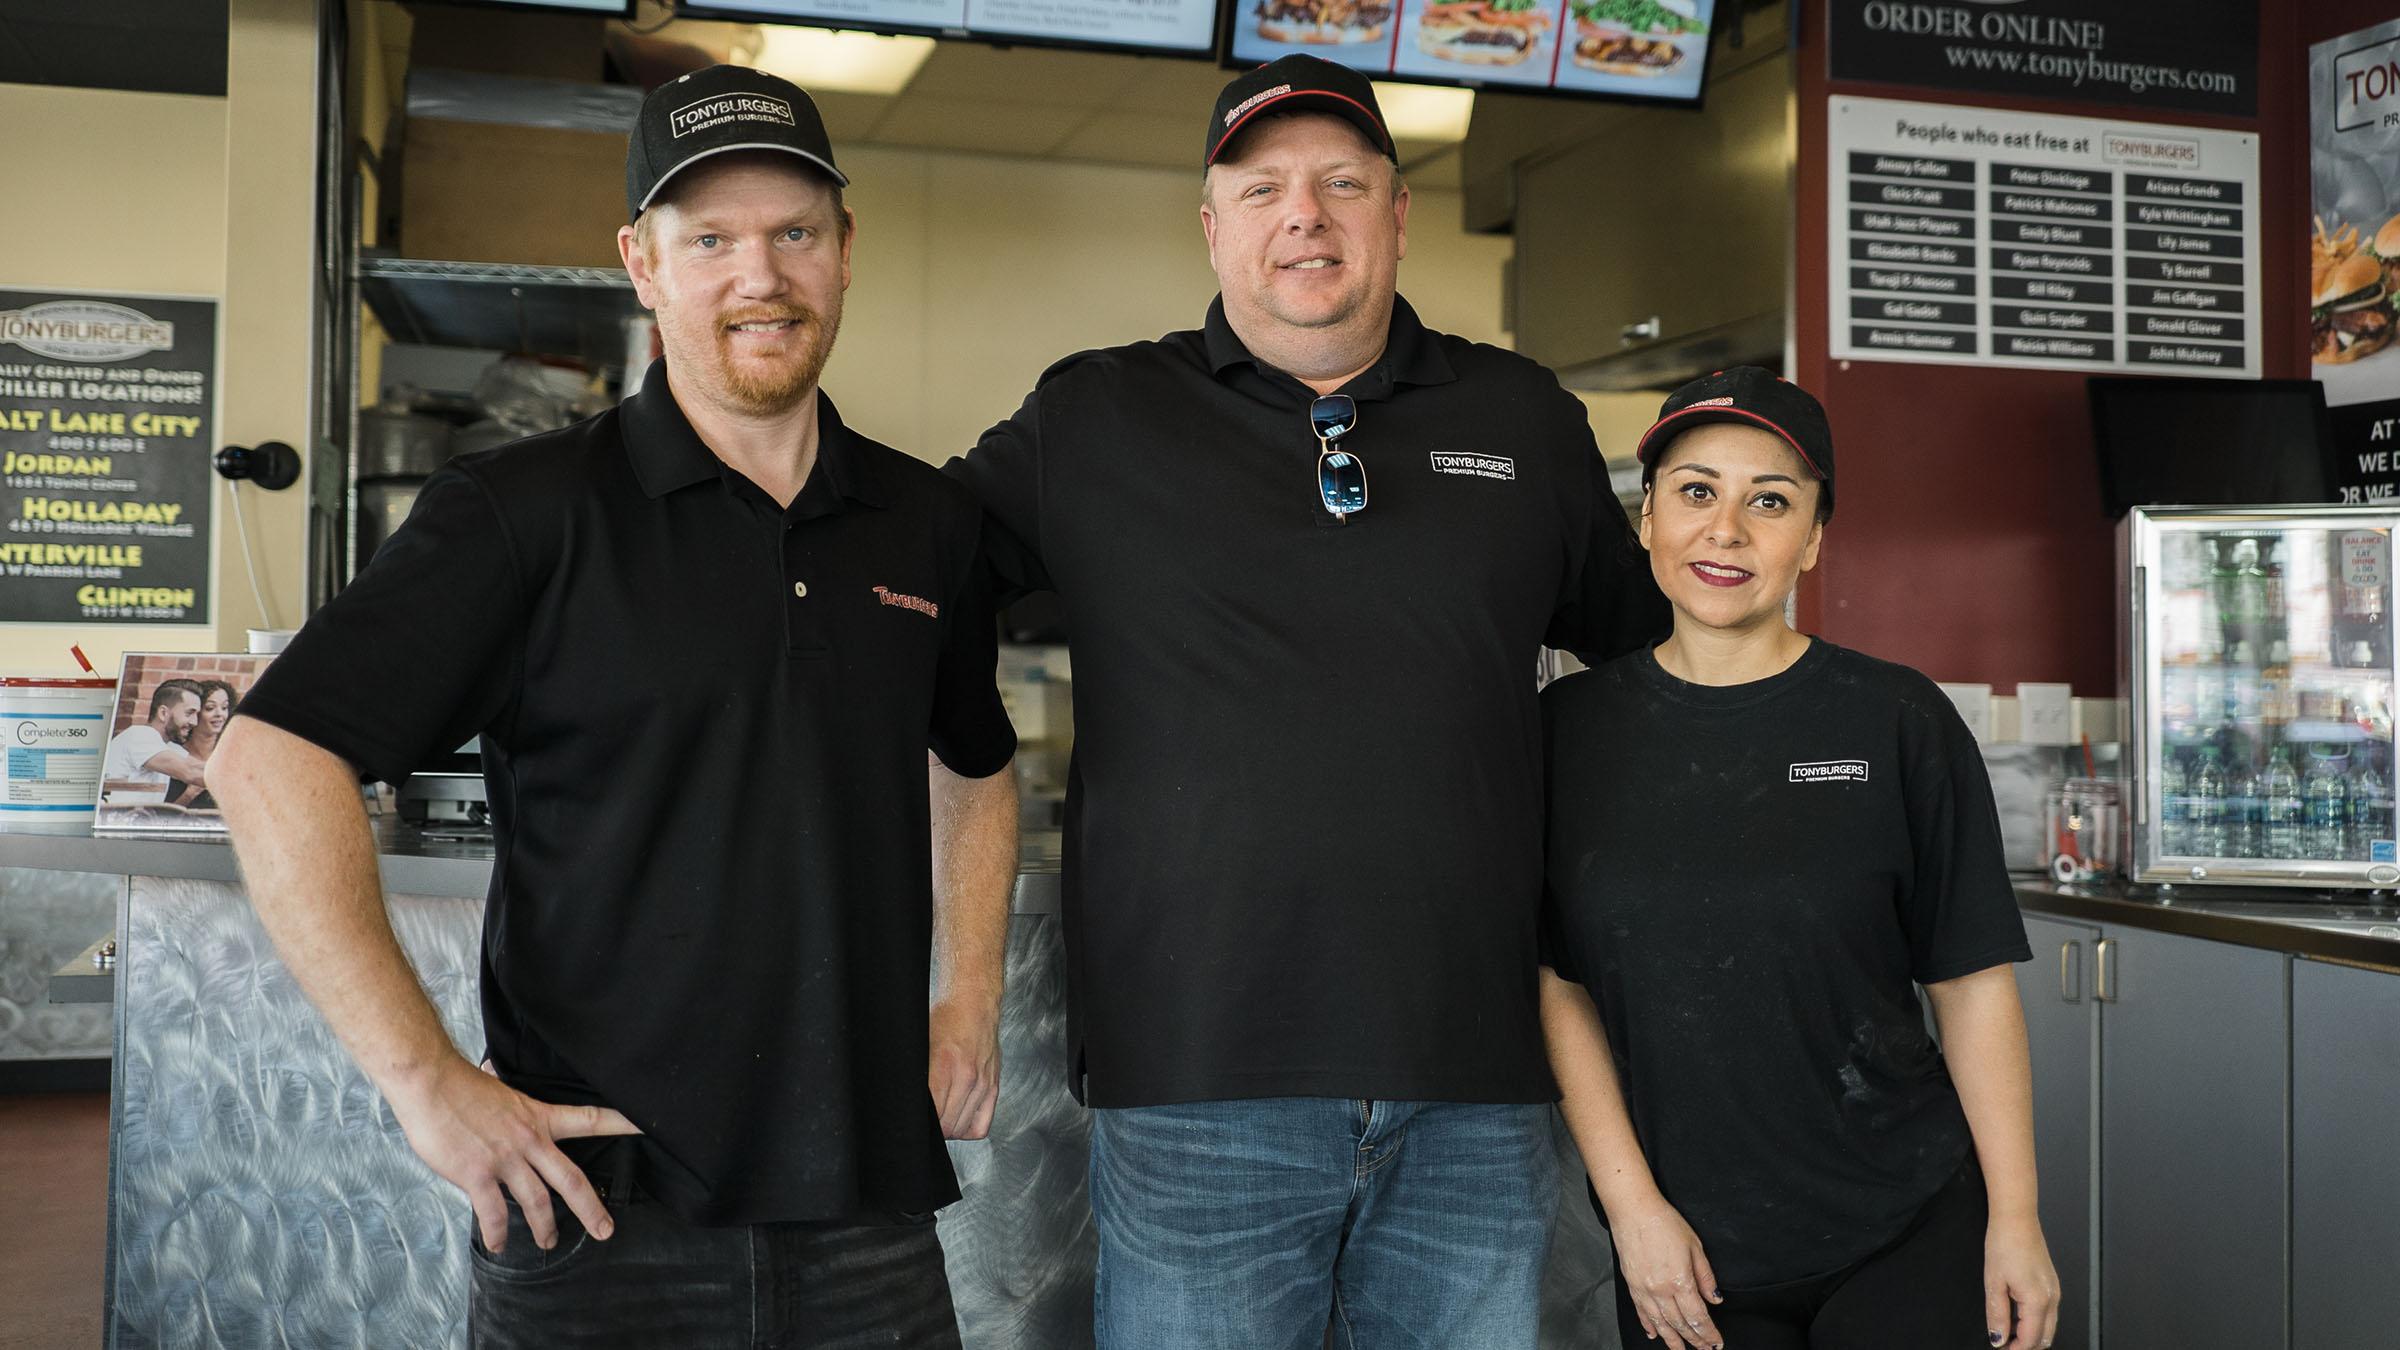 tonyburgers-big-american-story-01399.jpg